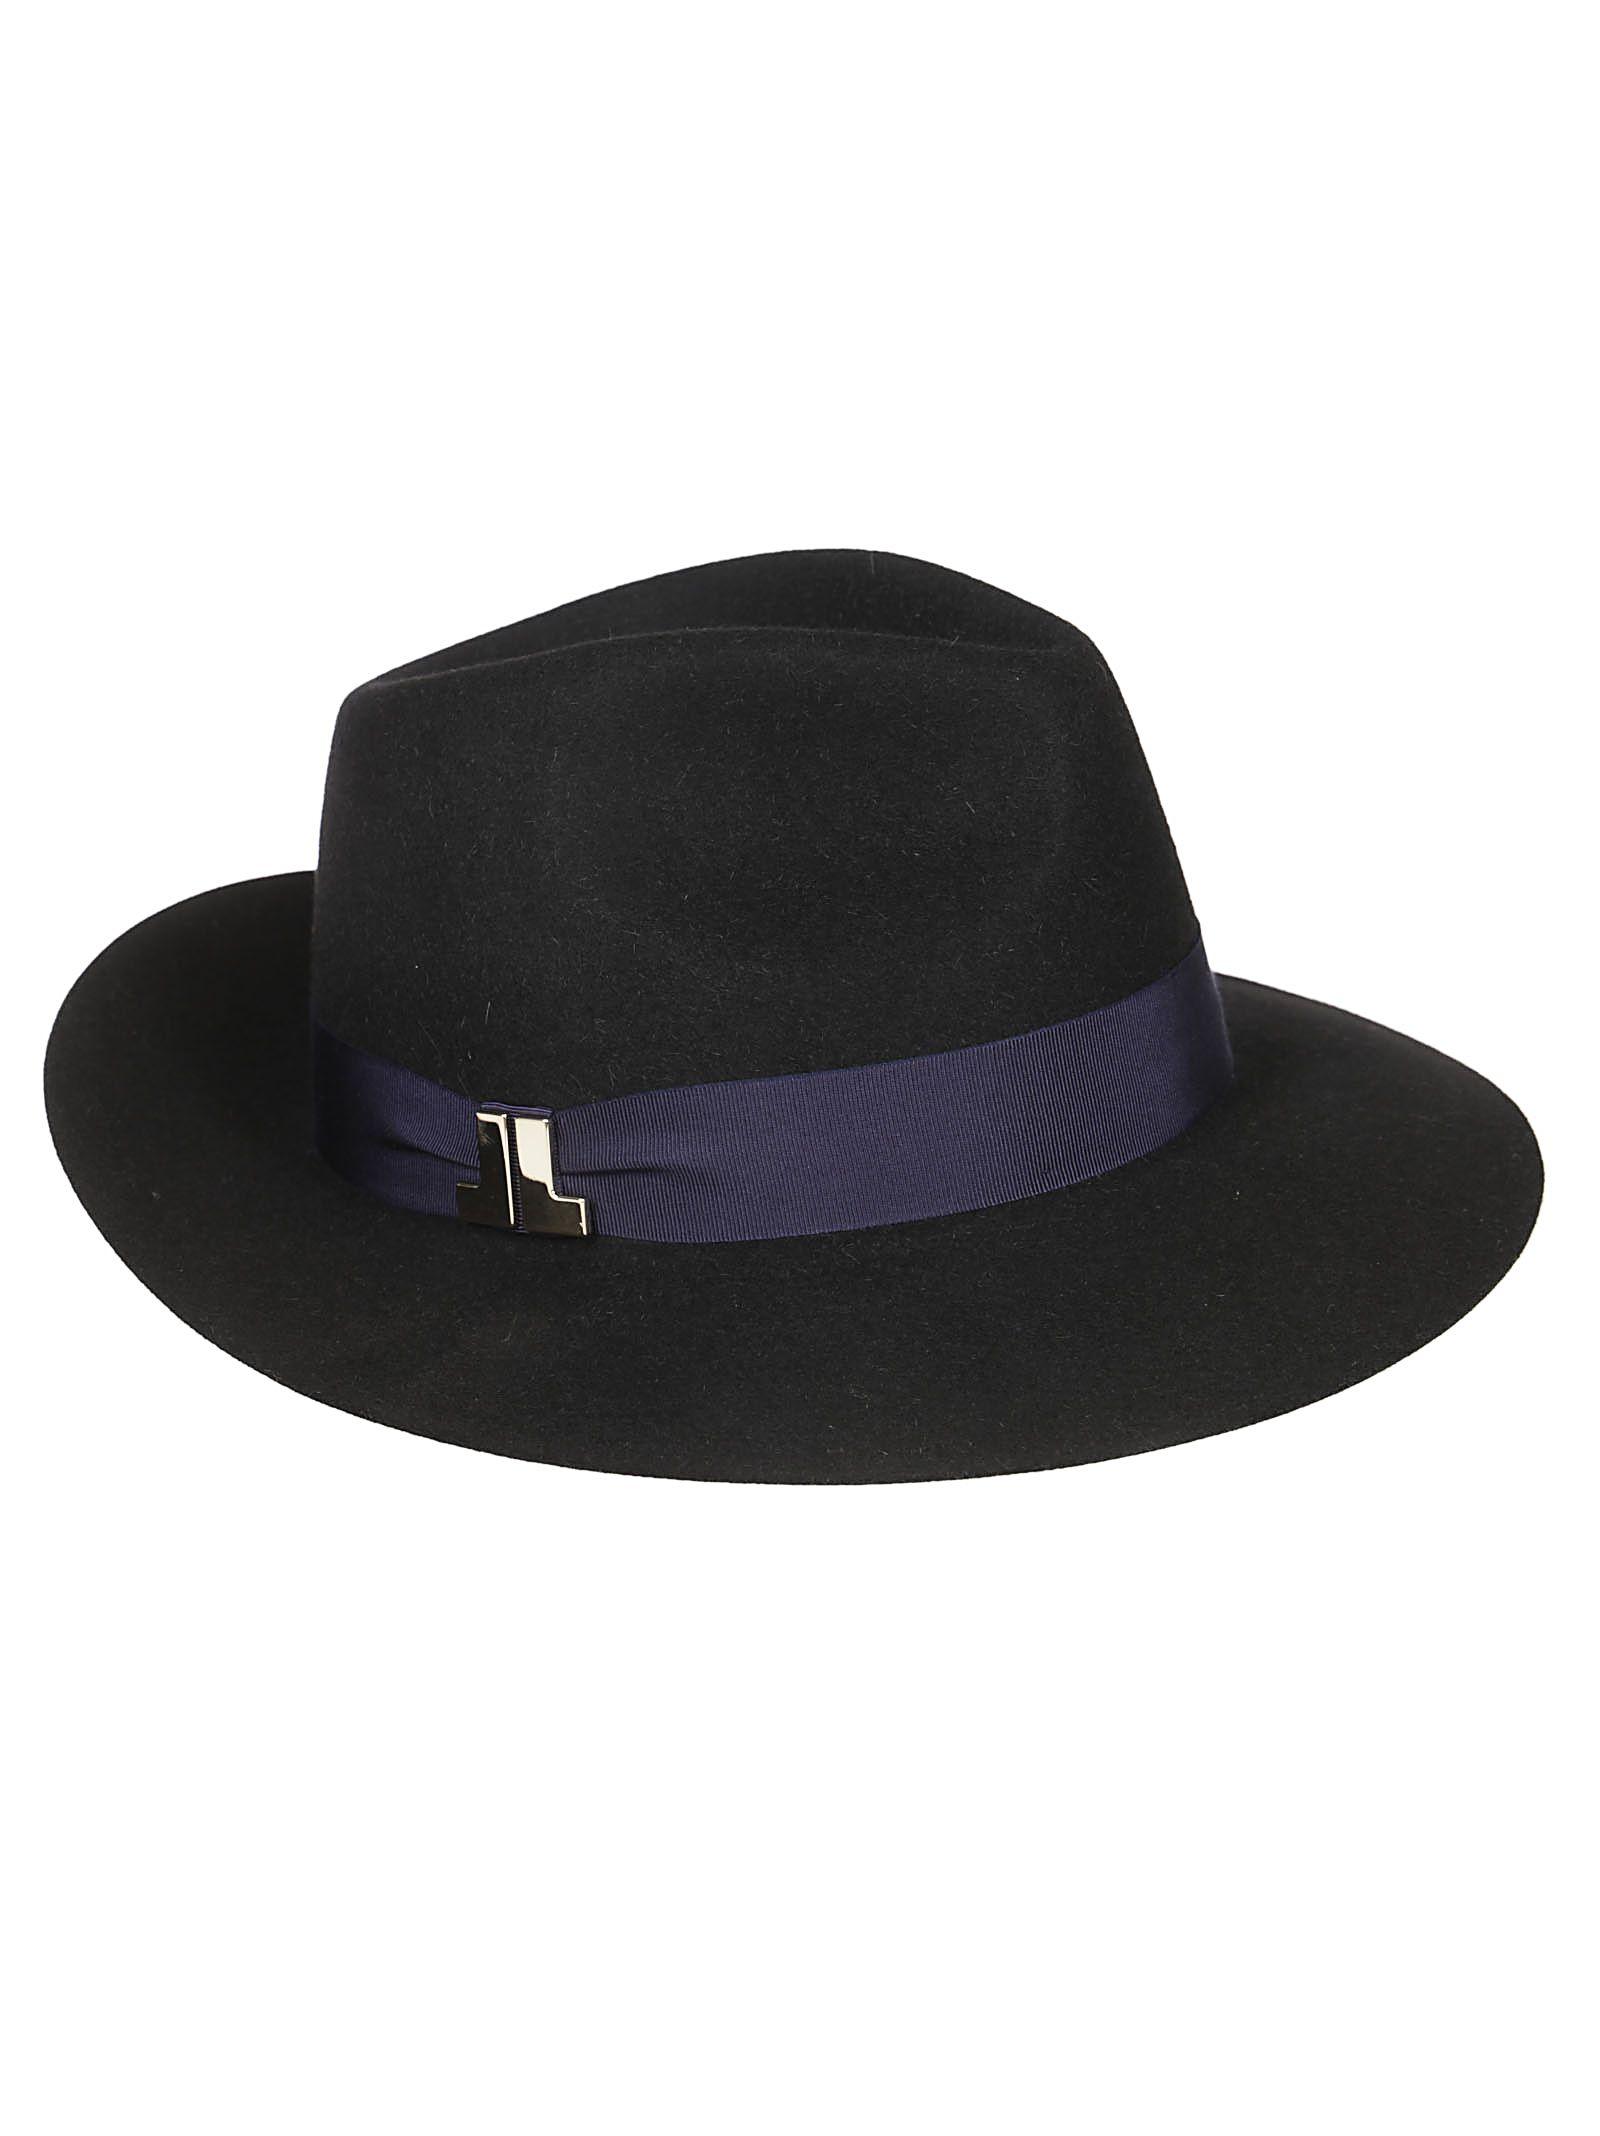 LANVIN RIBBON PANAMA HAT